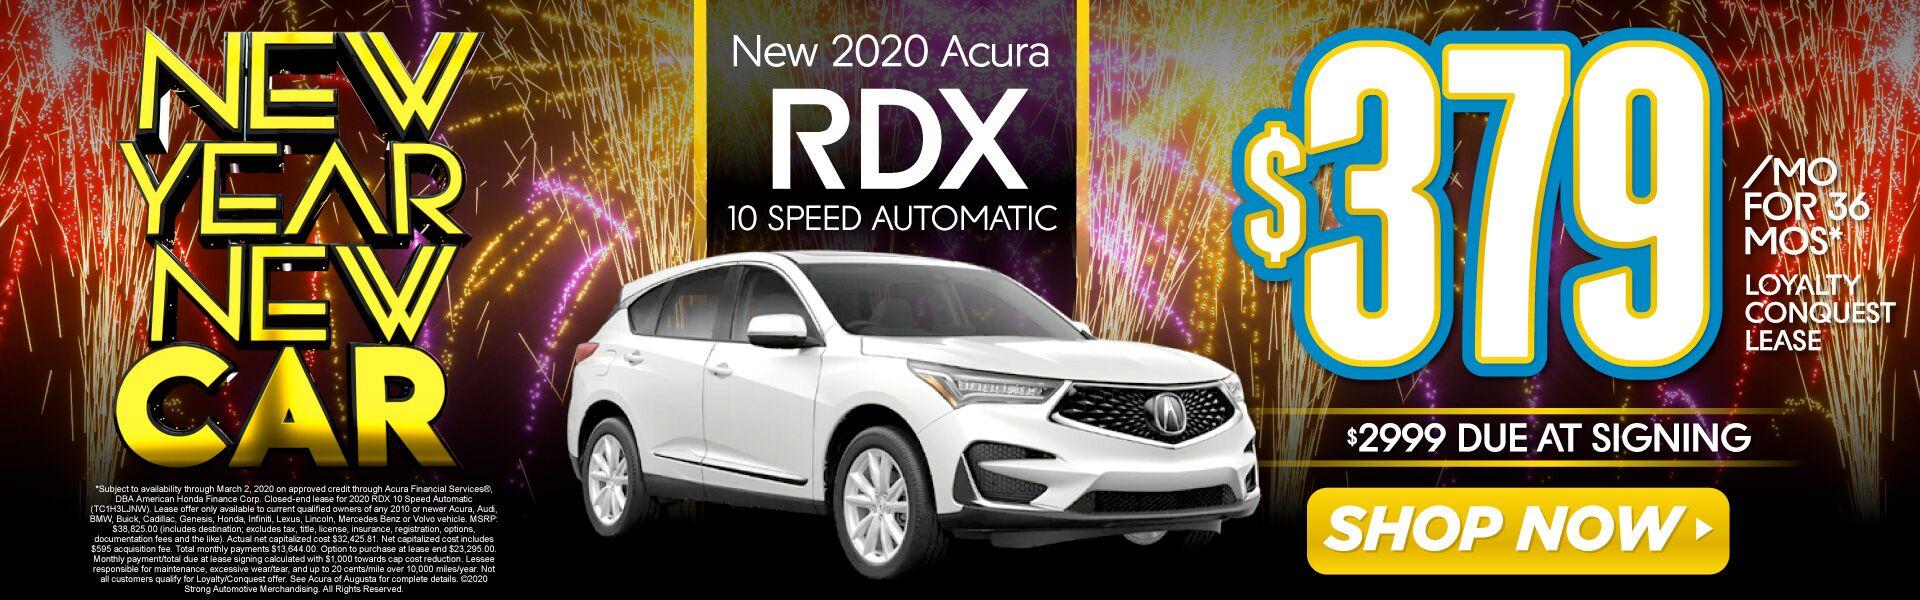 Used Cars Augusta Ga >> Acura Of Augusta New Acura Used Car Dealer In Augusta Ga